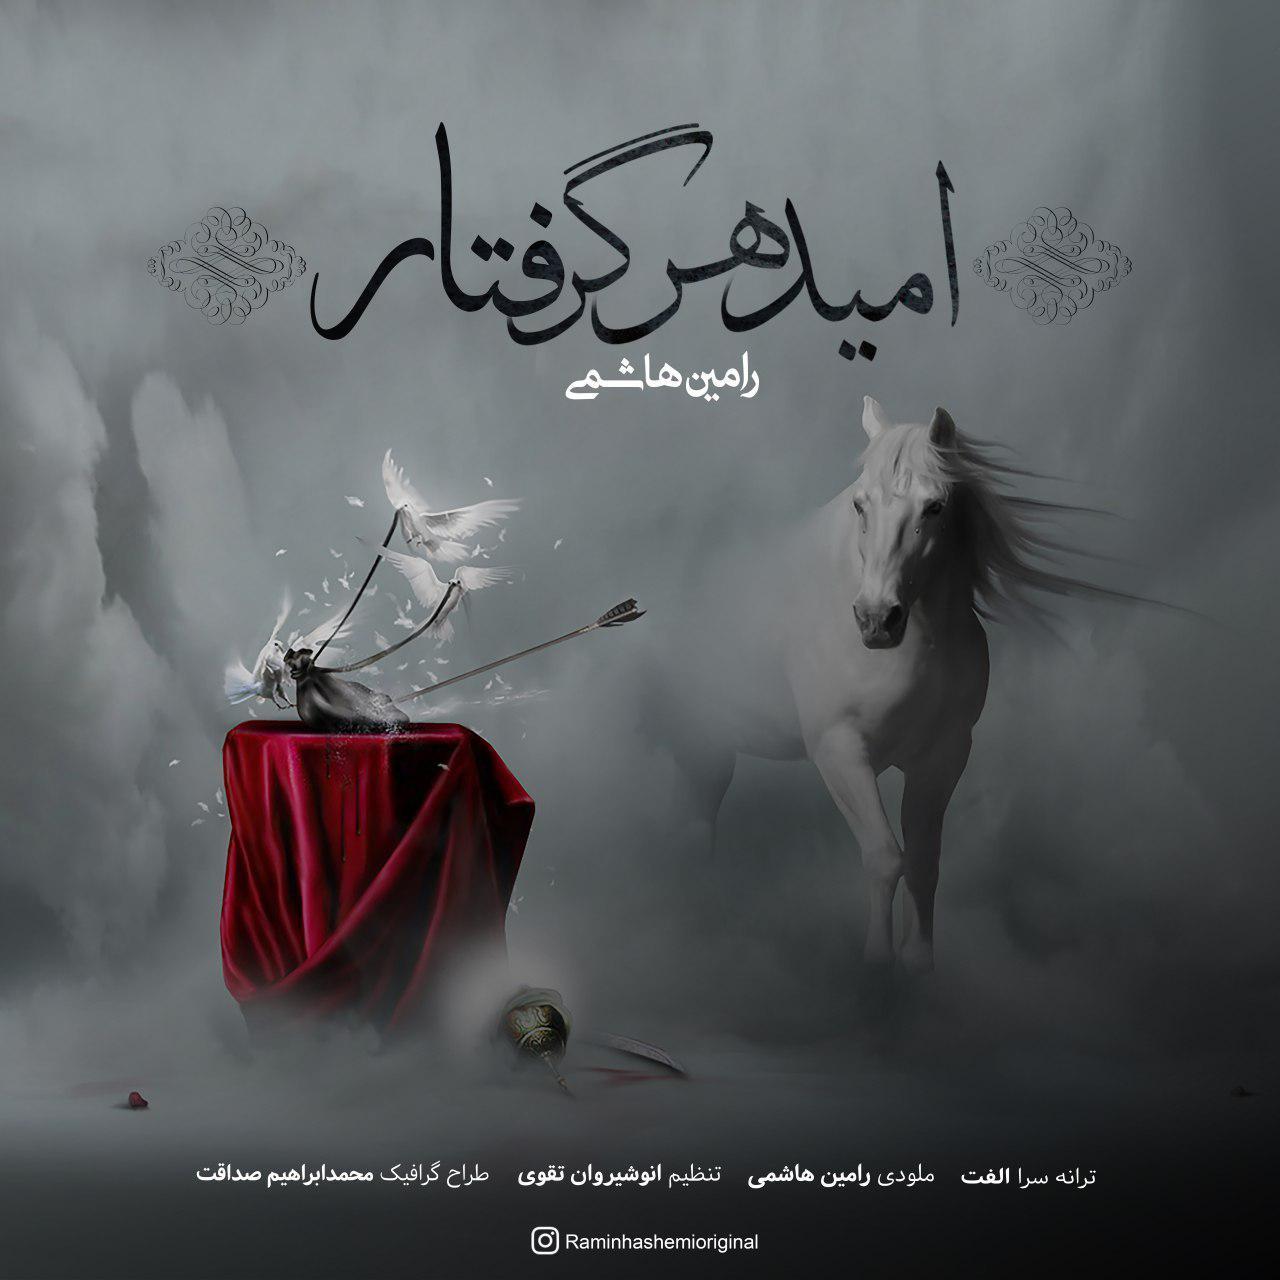 Ramin Hashemi – Omide Har Gereftar